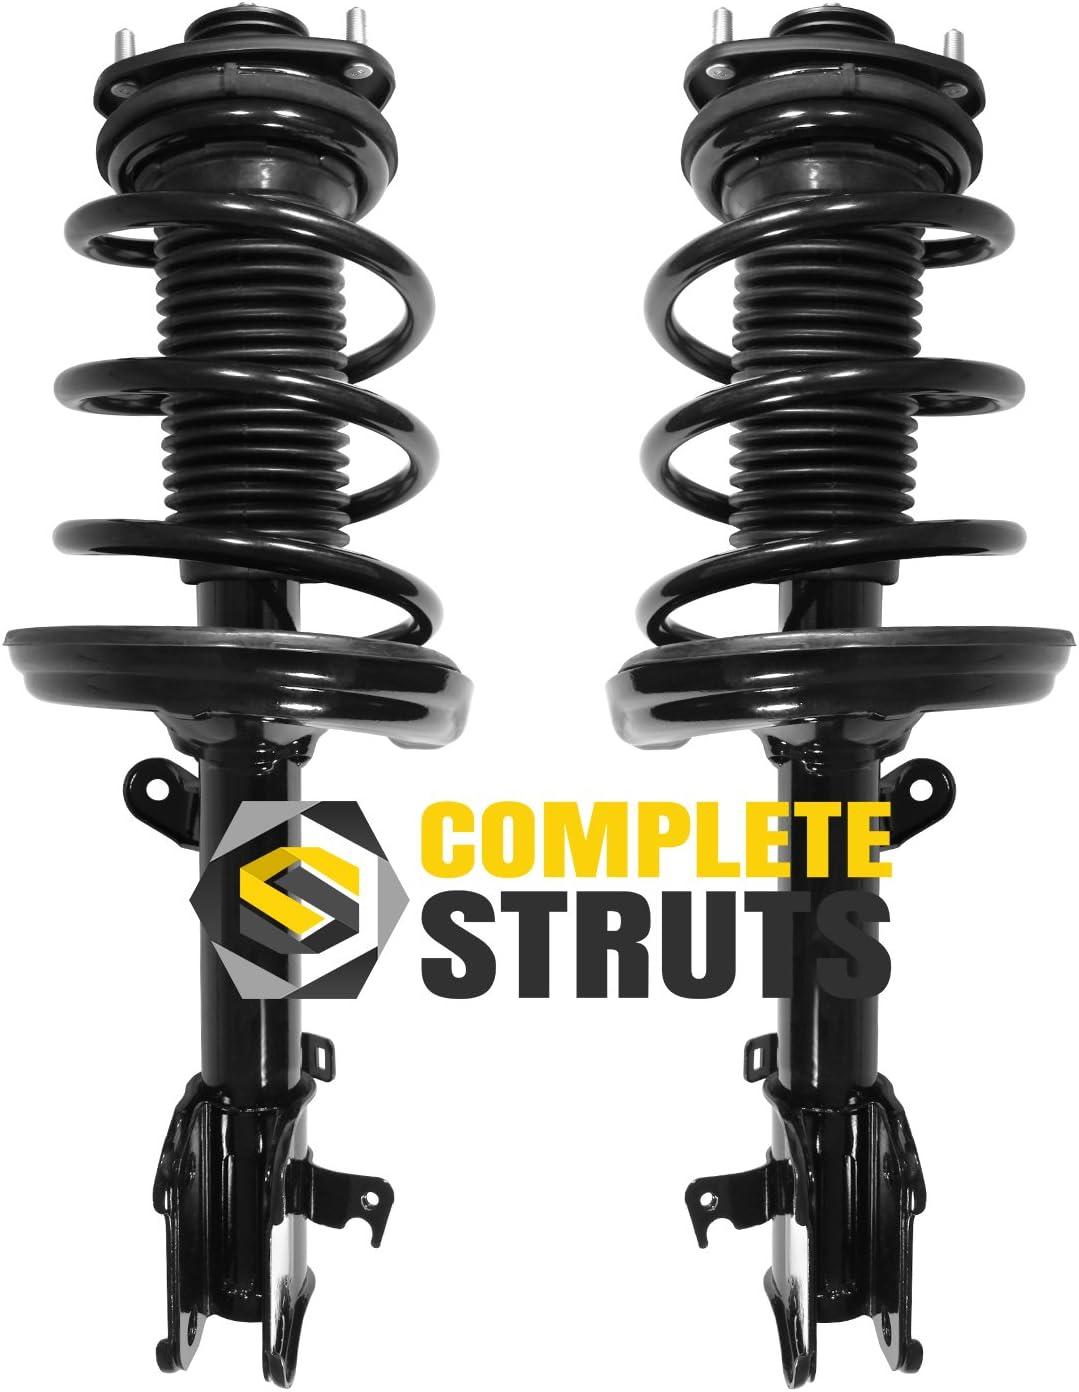 1331634 Front Driver and Passenger Side Complete Strut Spring Assembly fit for 2006-2014 Honda Ridgeline TUPARTS Struts